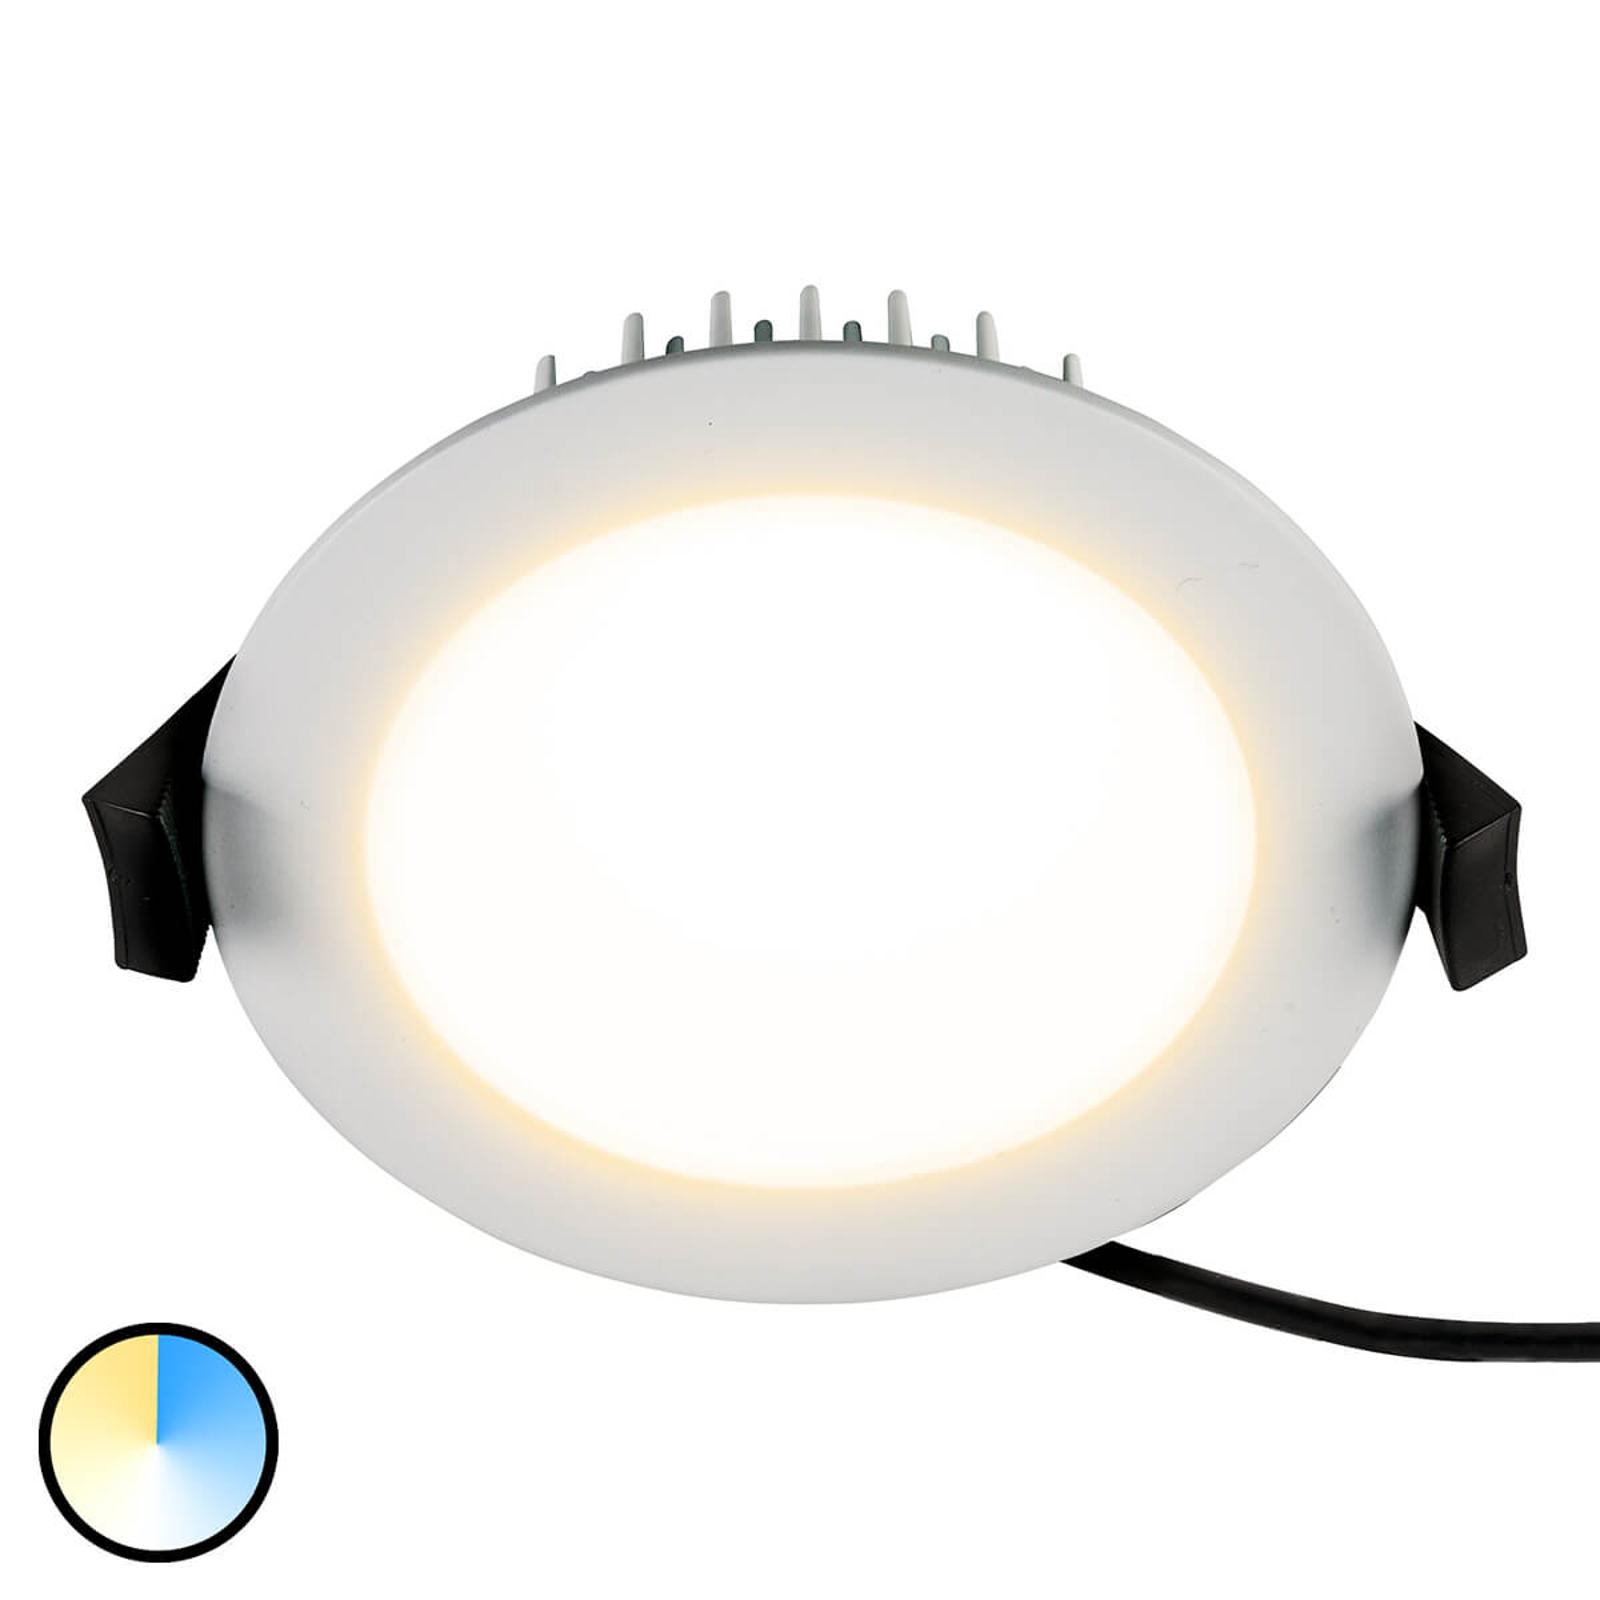 LED-Einbaustrahler Lino 3.000K-5.700K 13 W weiß